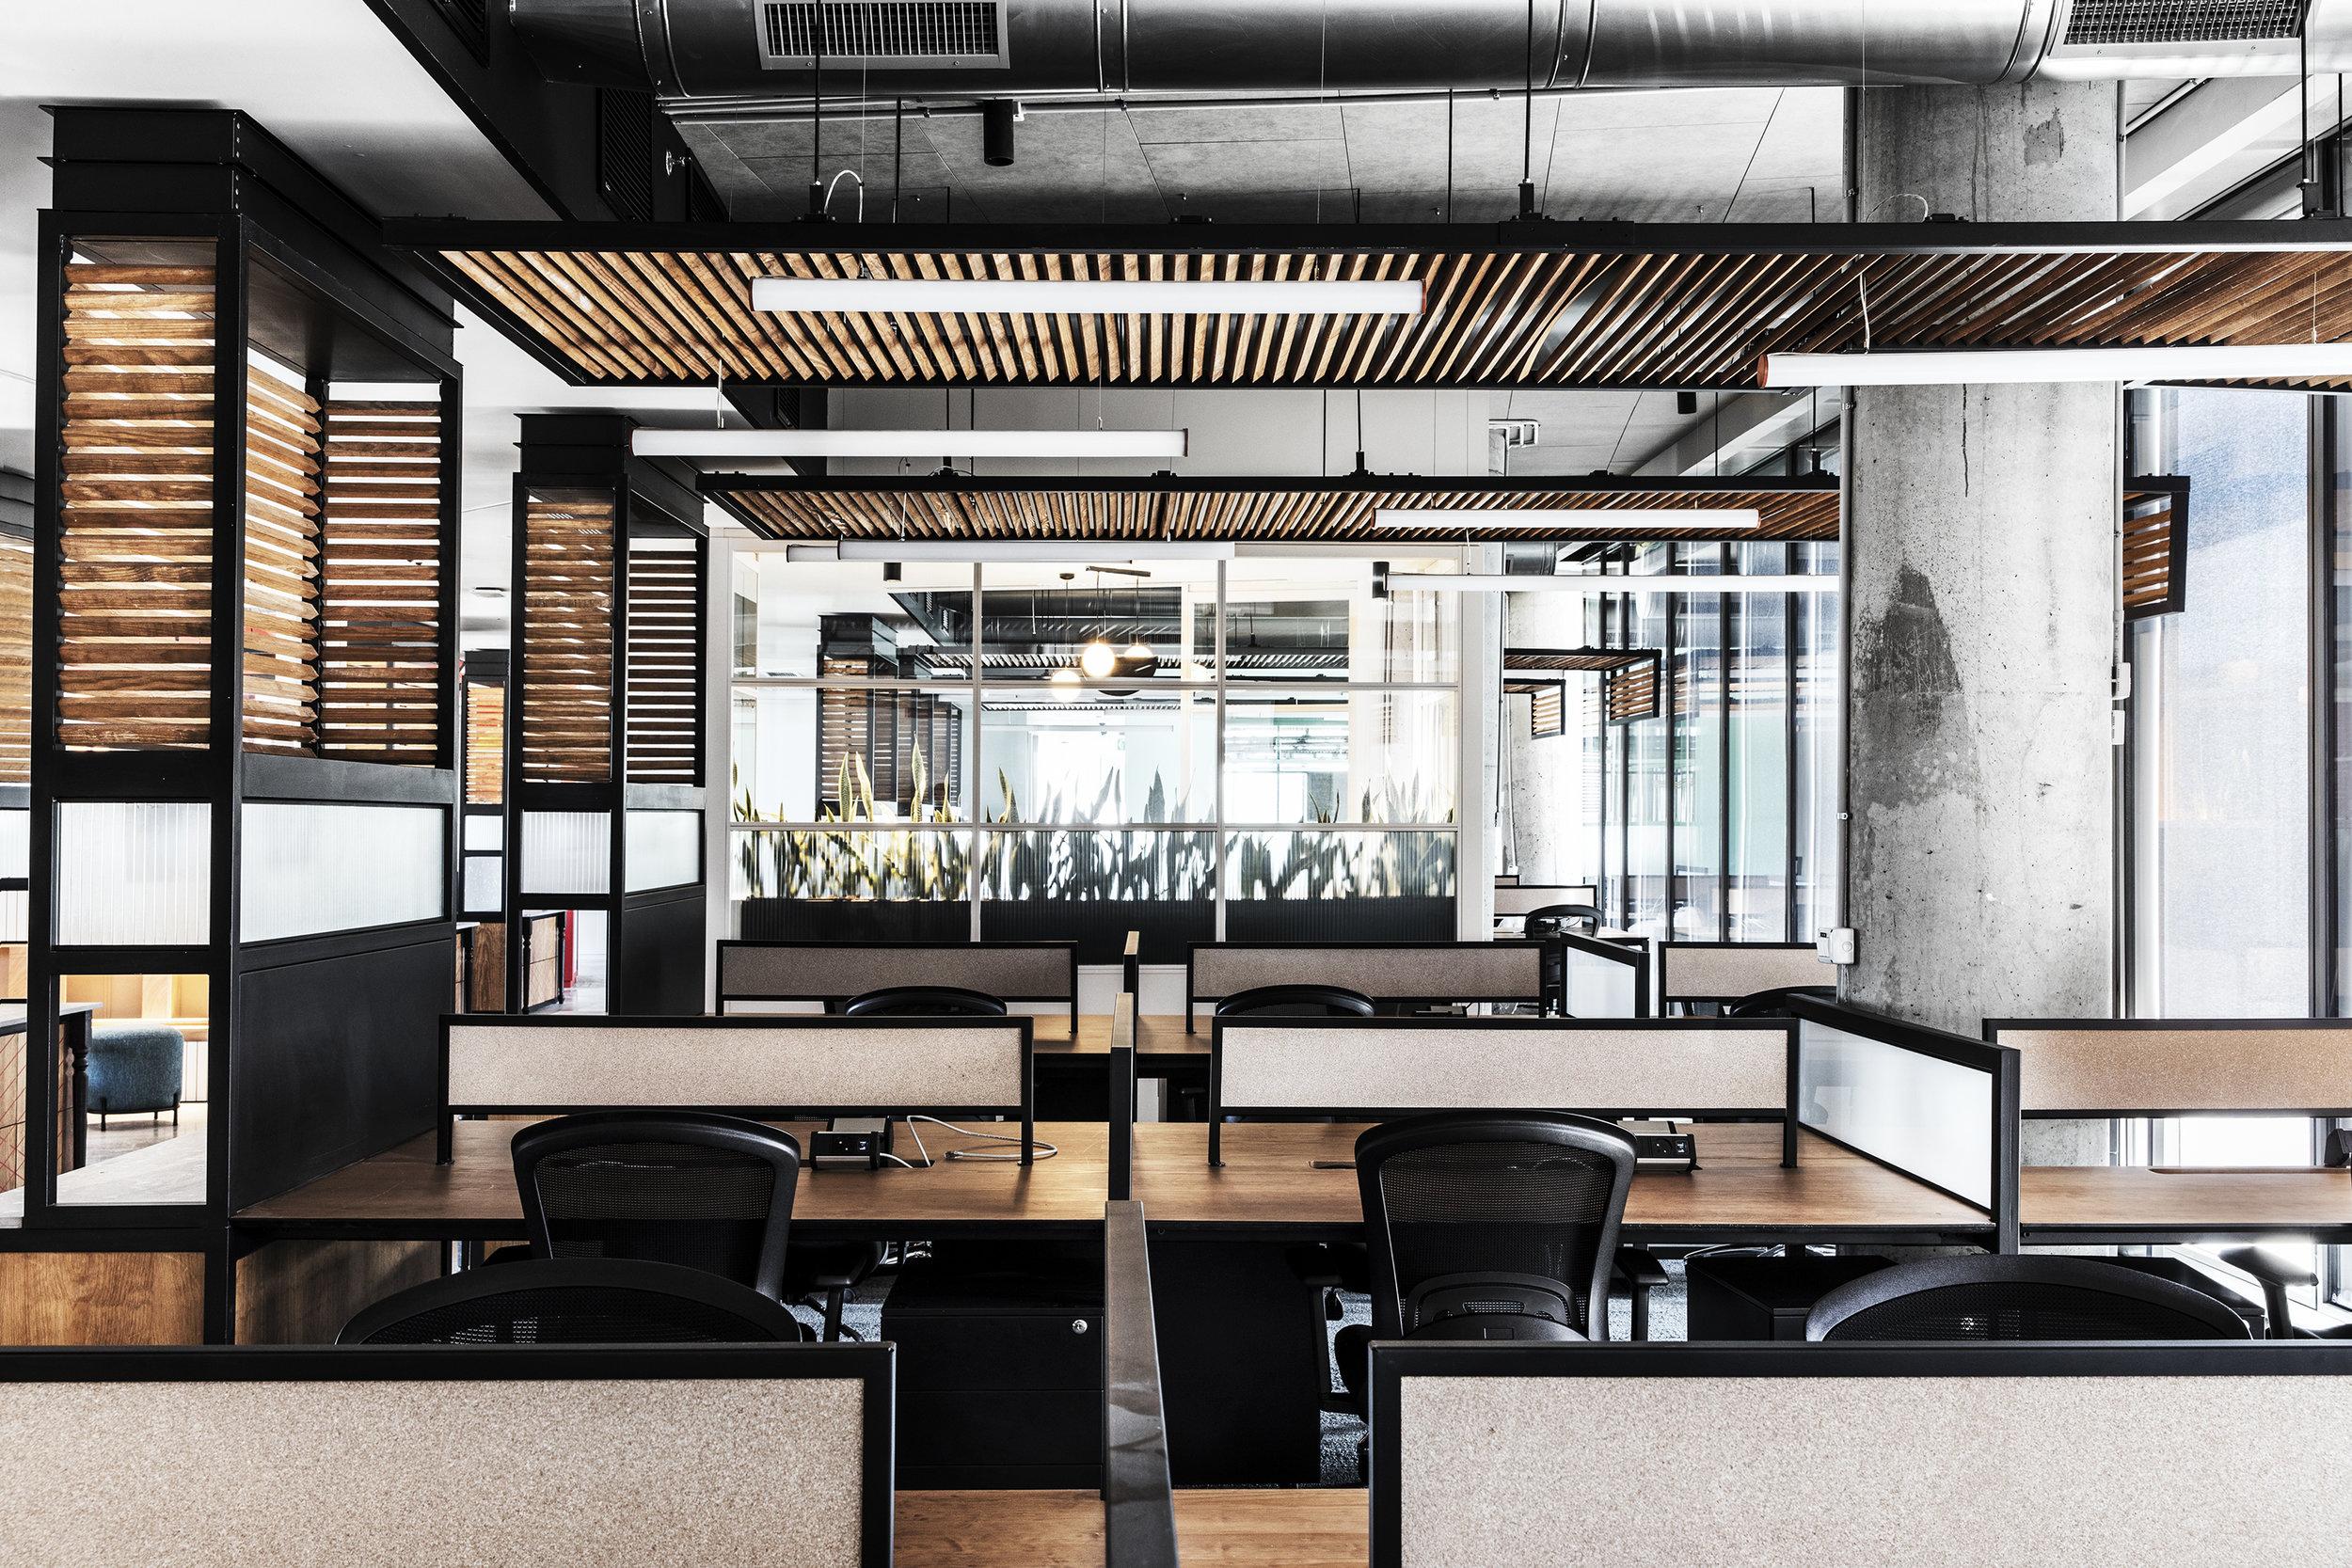 רואי דוד אדריכלות - אדריכל - נטורל אינטליג'נס - ROY DAVID - ARCHITECTURE - ARCHITECT - NI (29).jpg